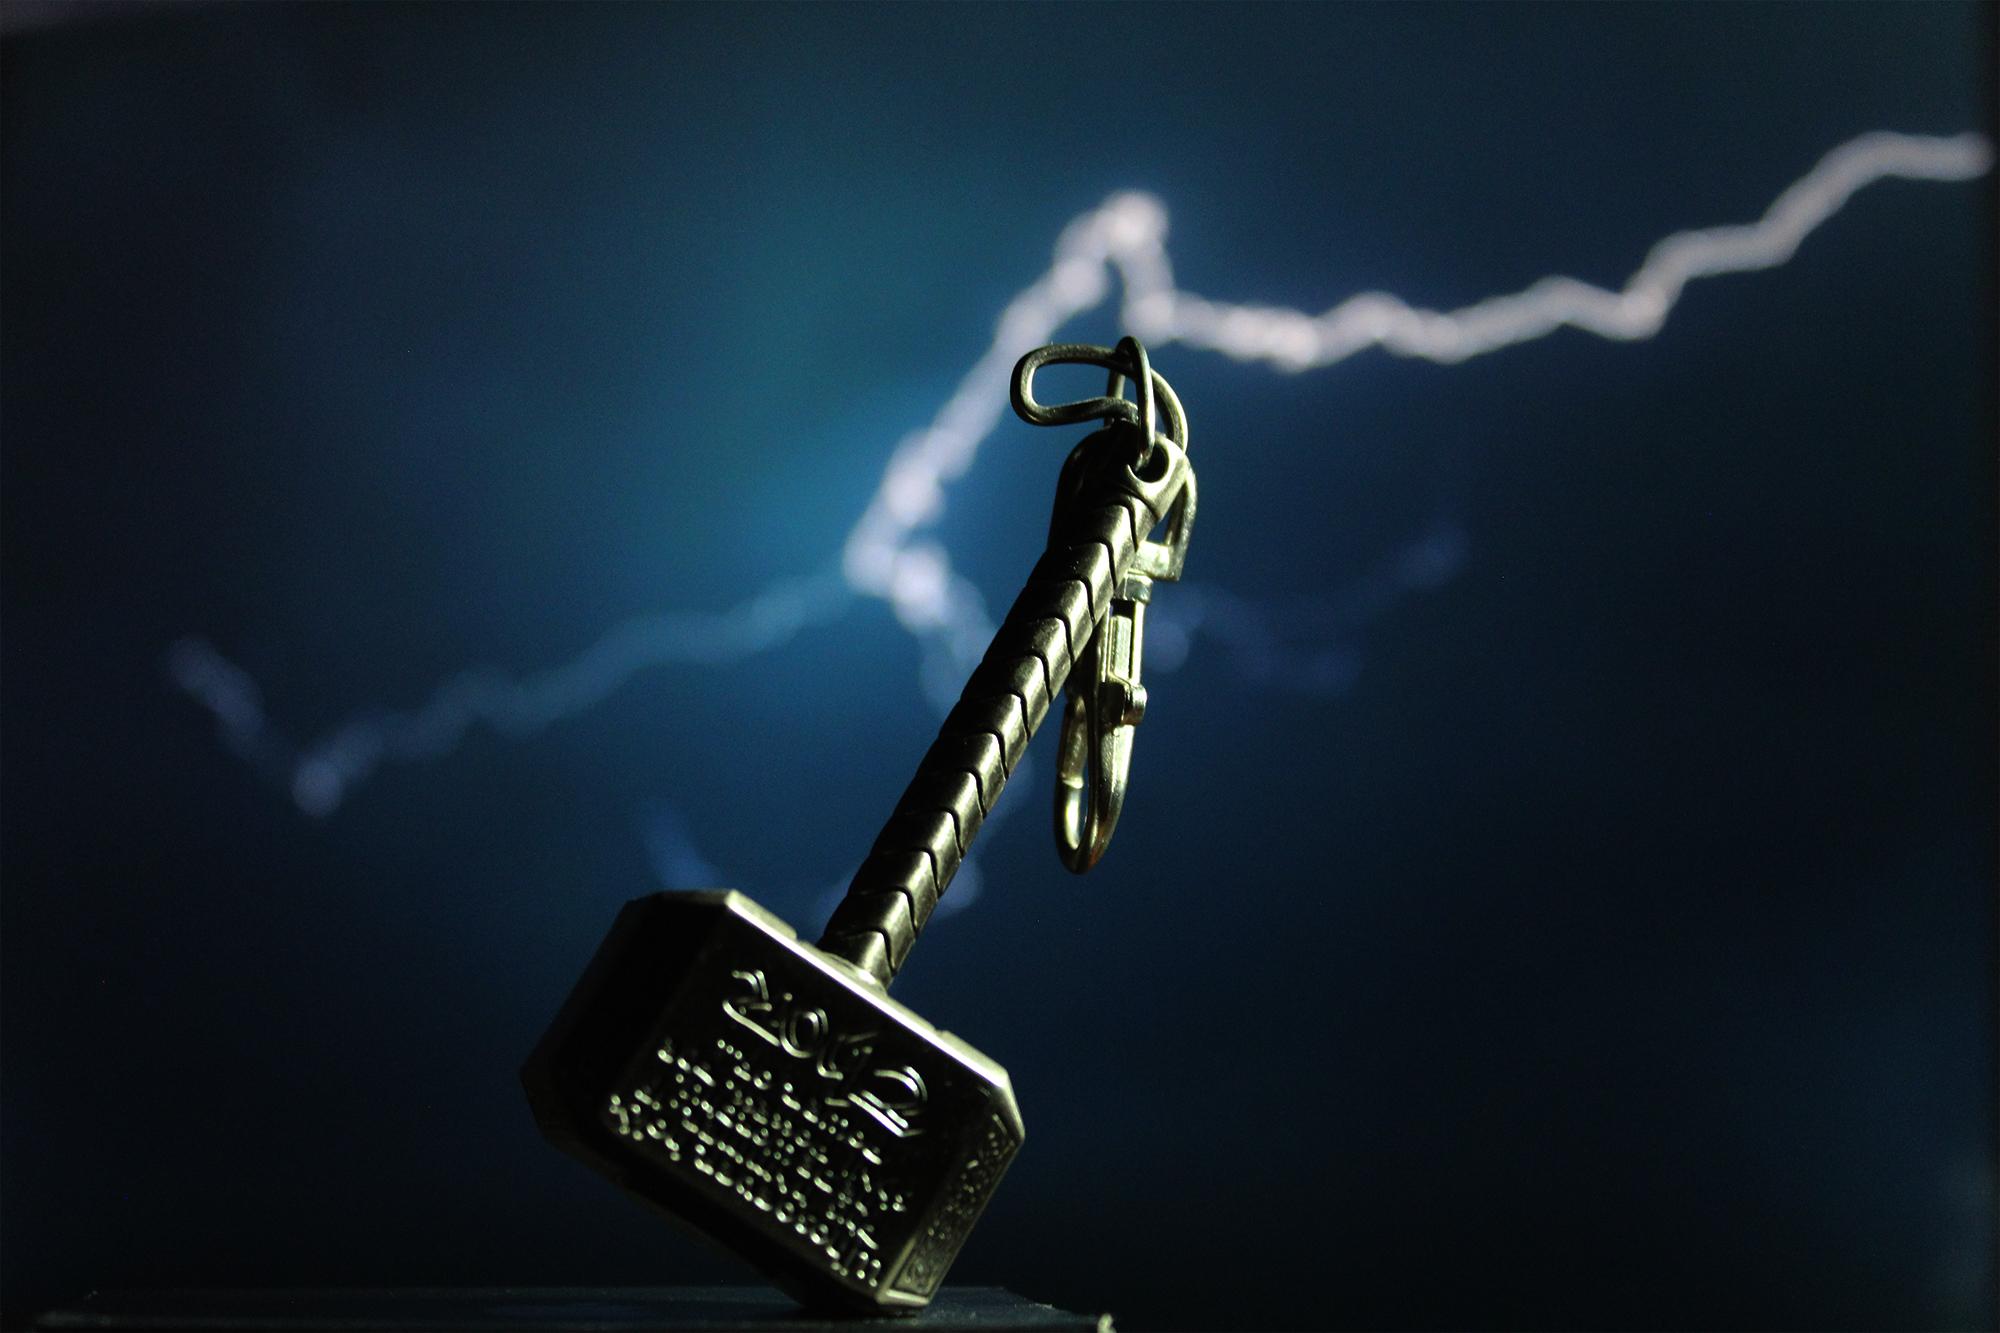 General 2000x1333 Thor Mjolnir lightning artwork keychain keyrings Marvel Cinematic Universe Marvel Comics